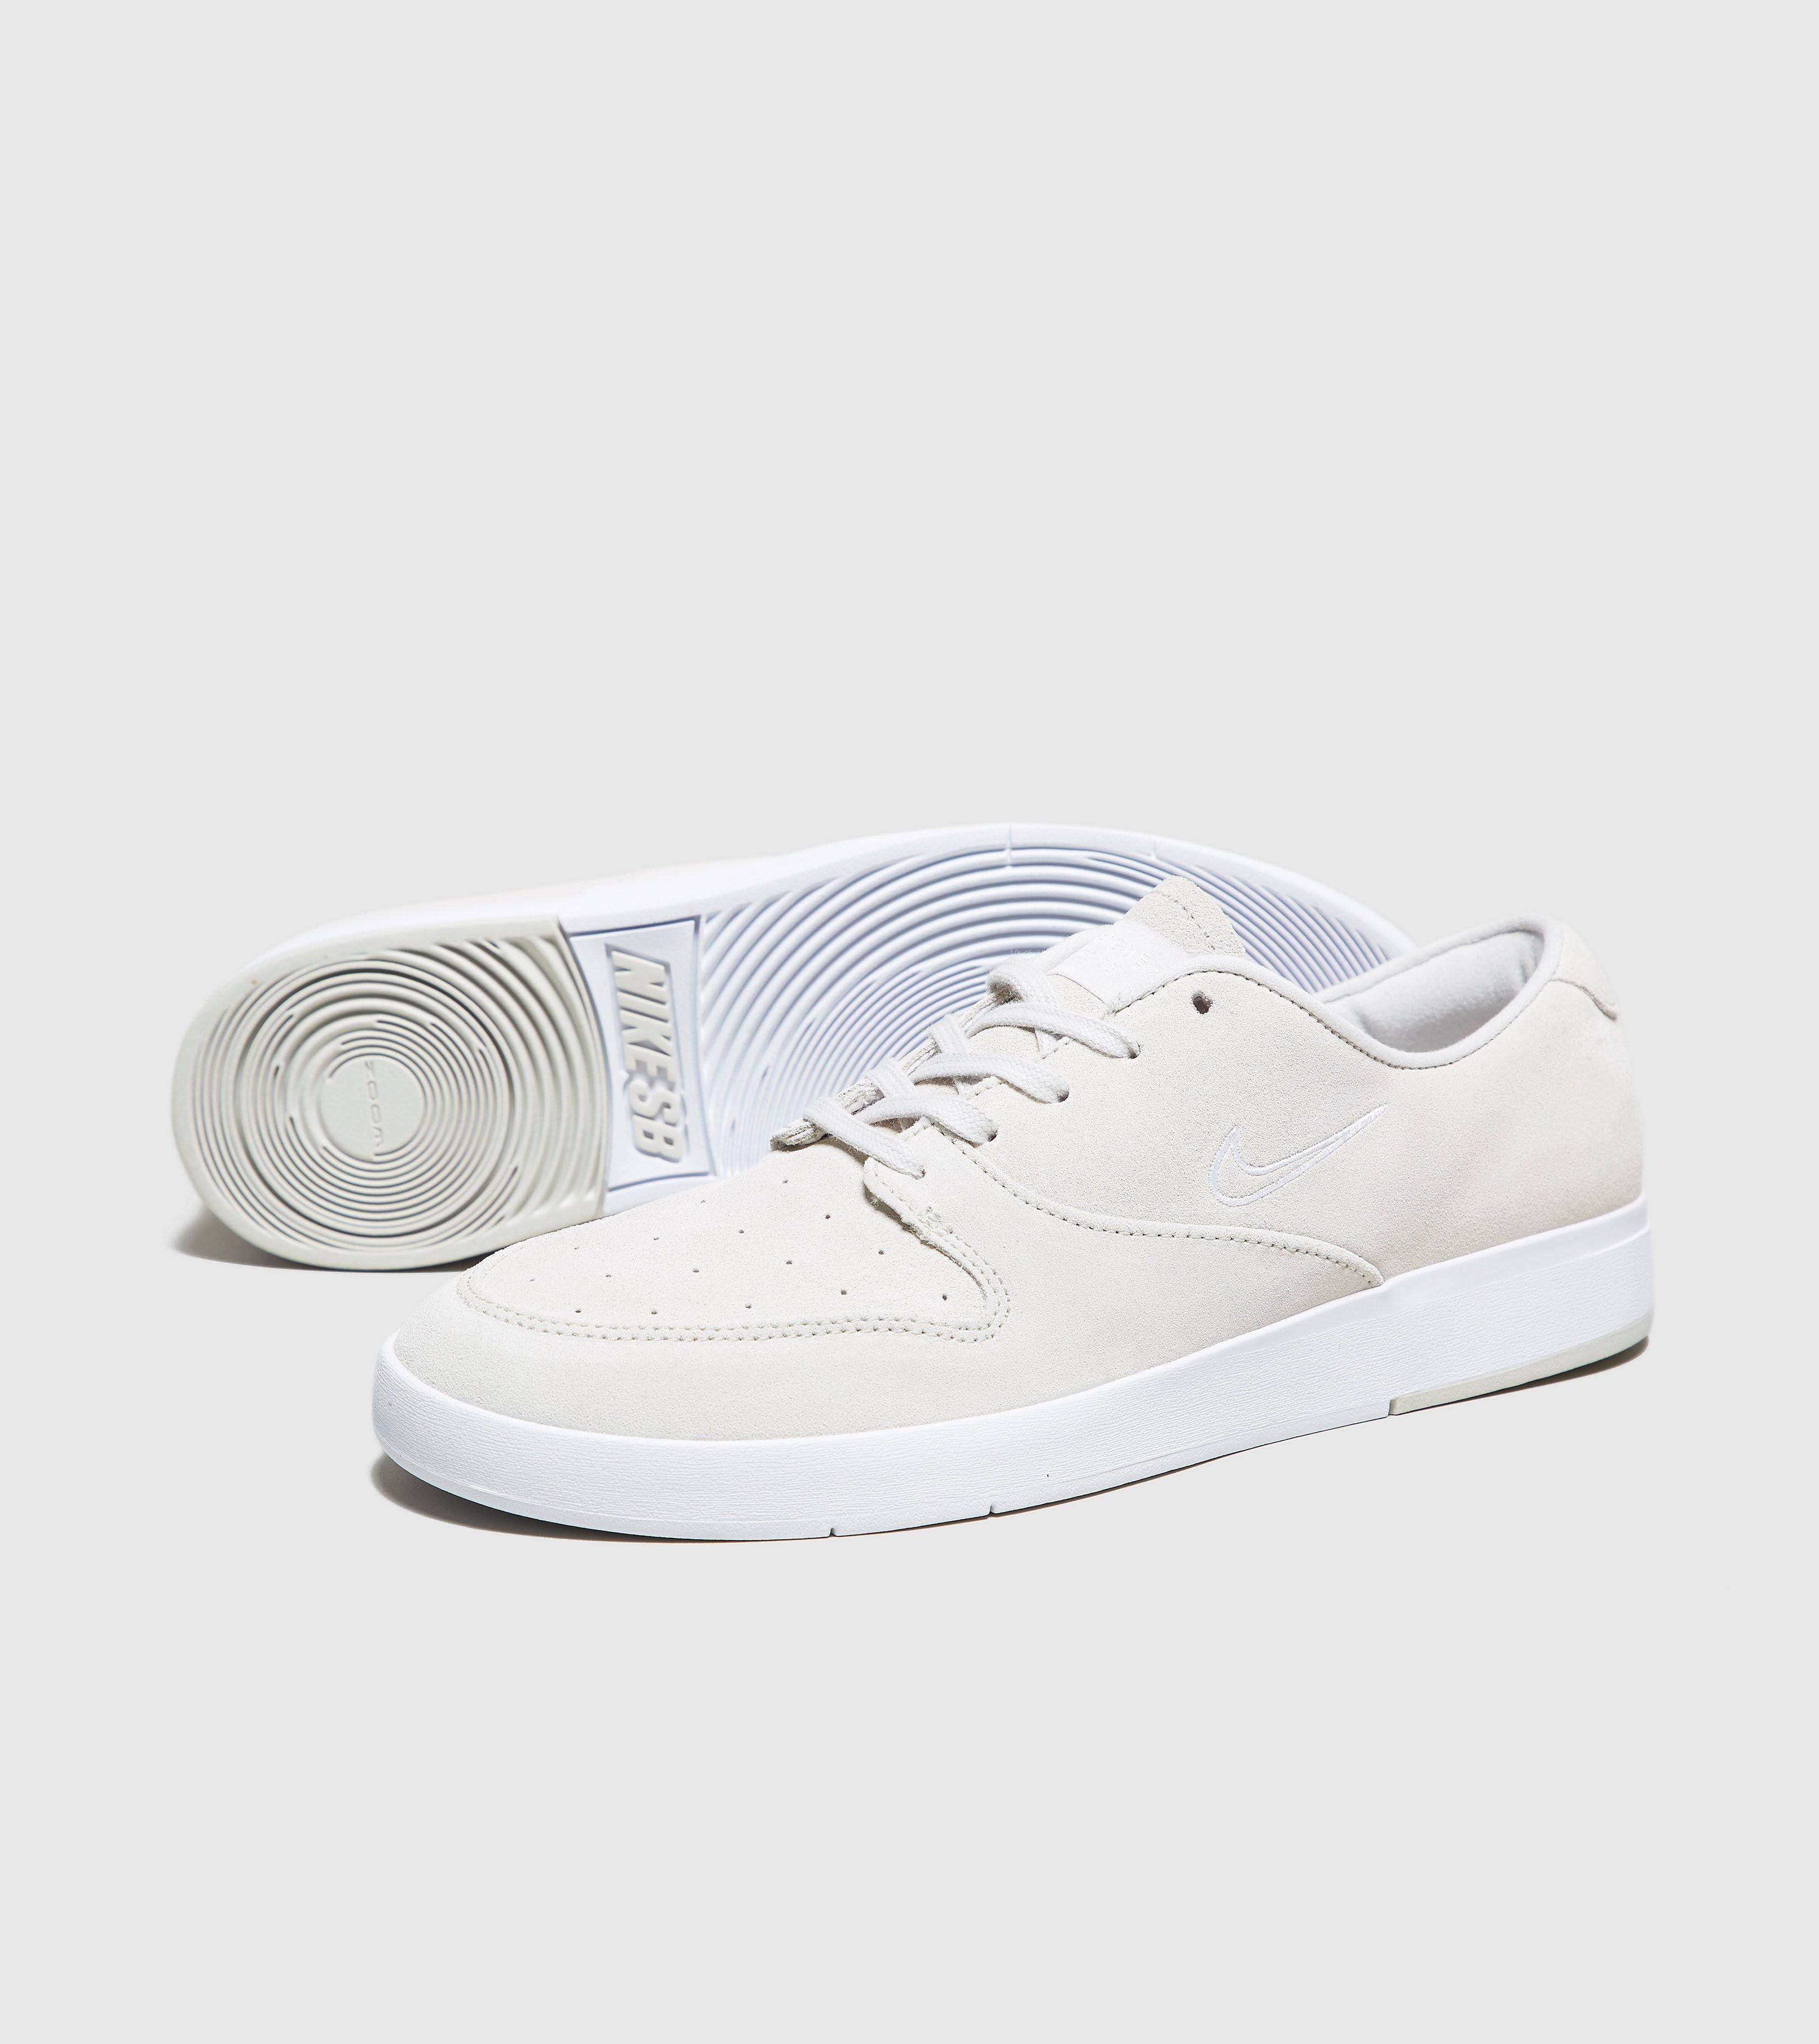 Nike SB x Paul Rodriguez Ten